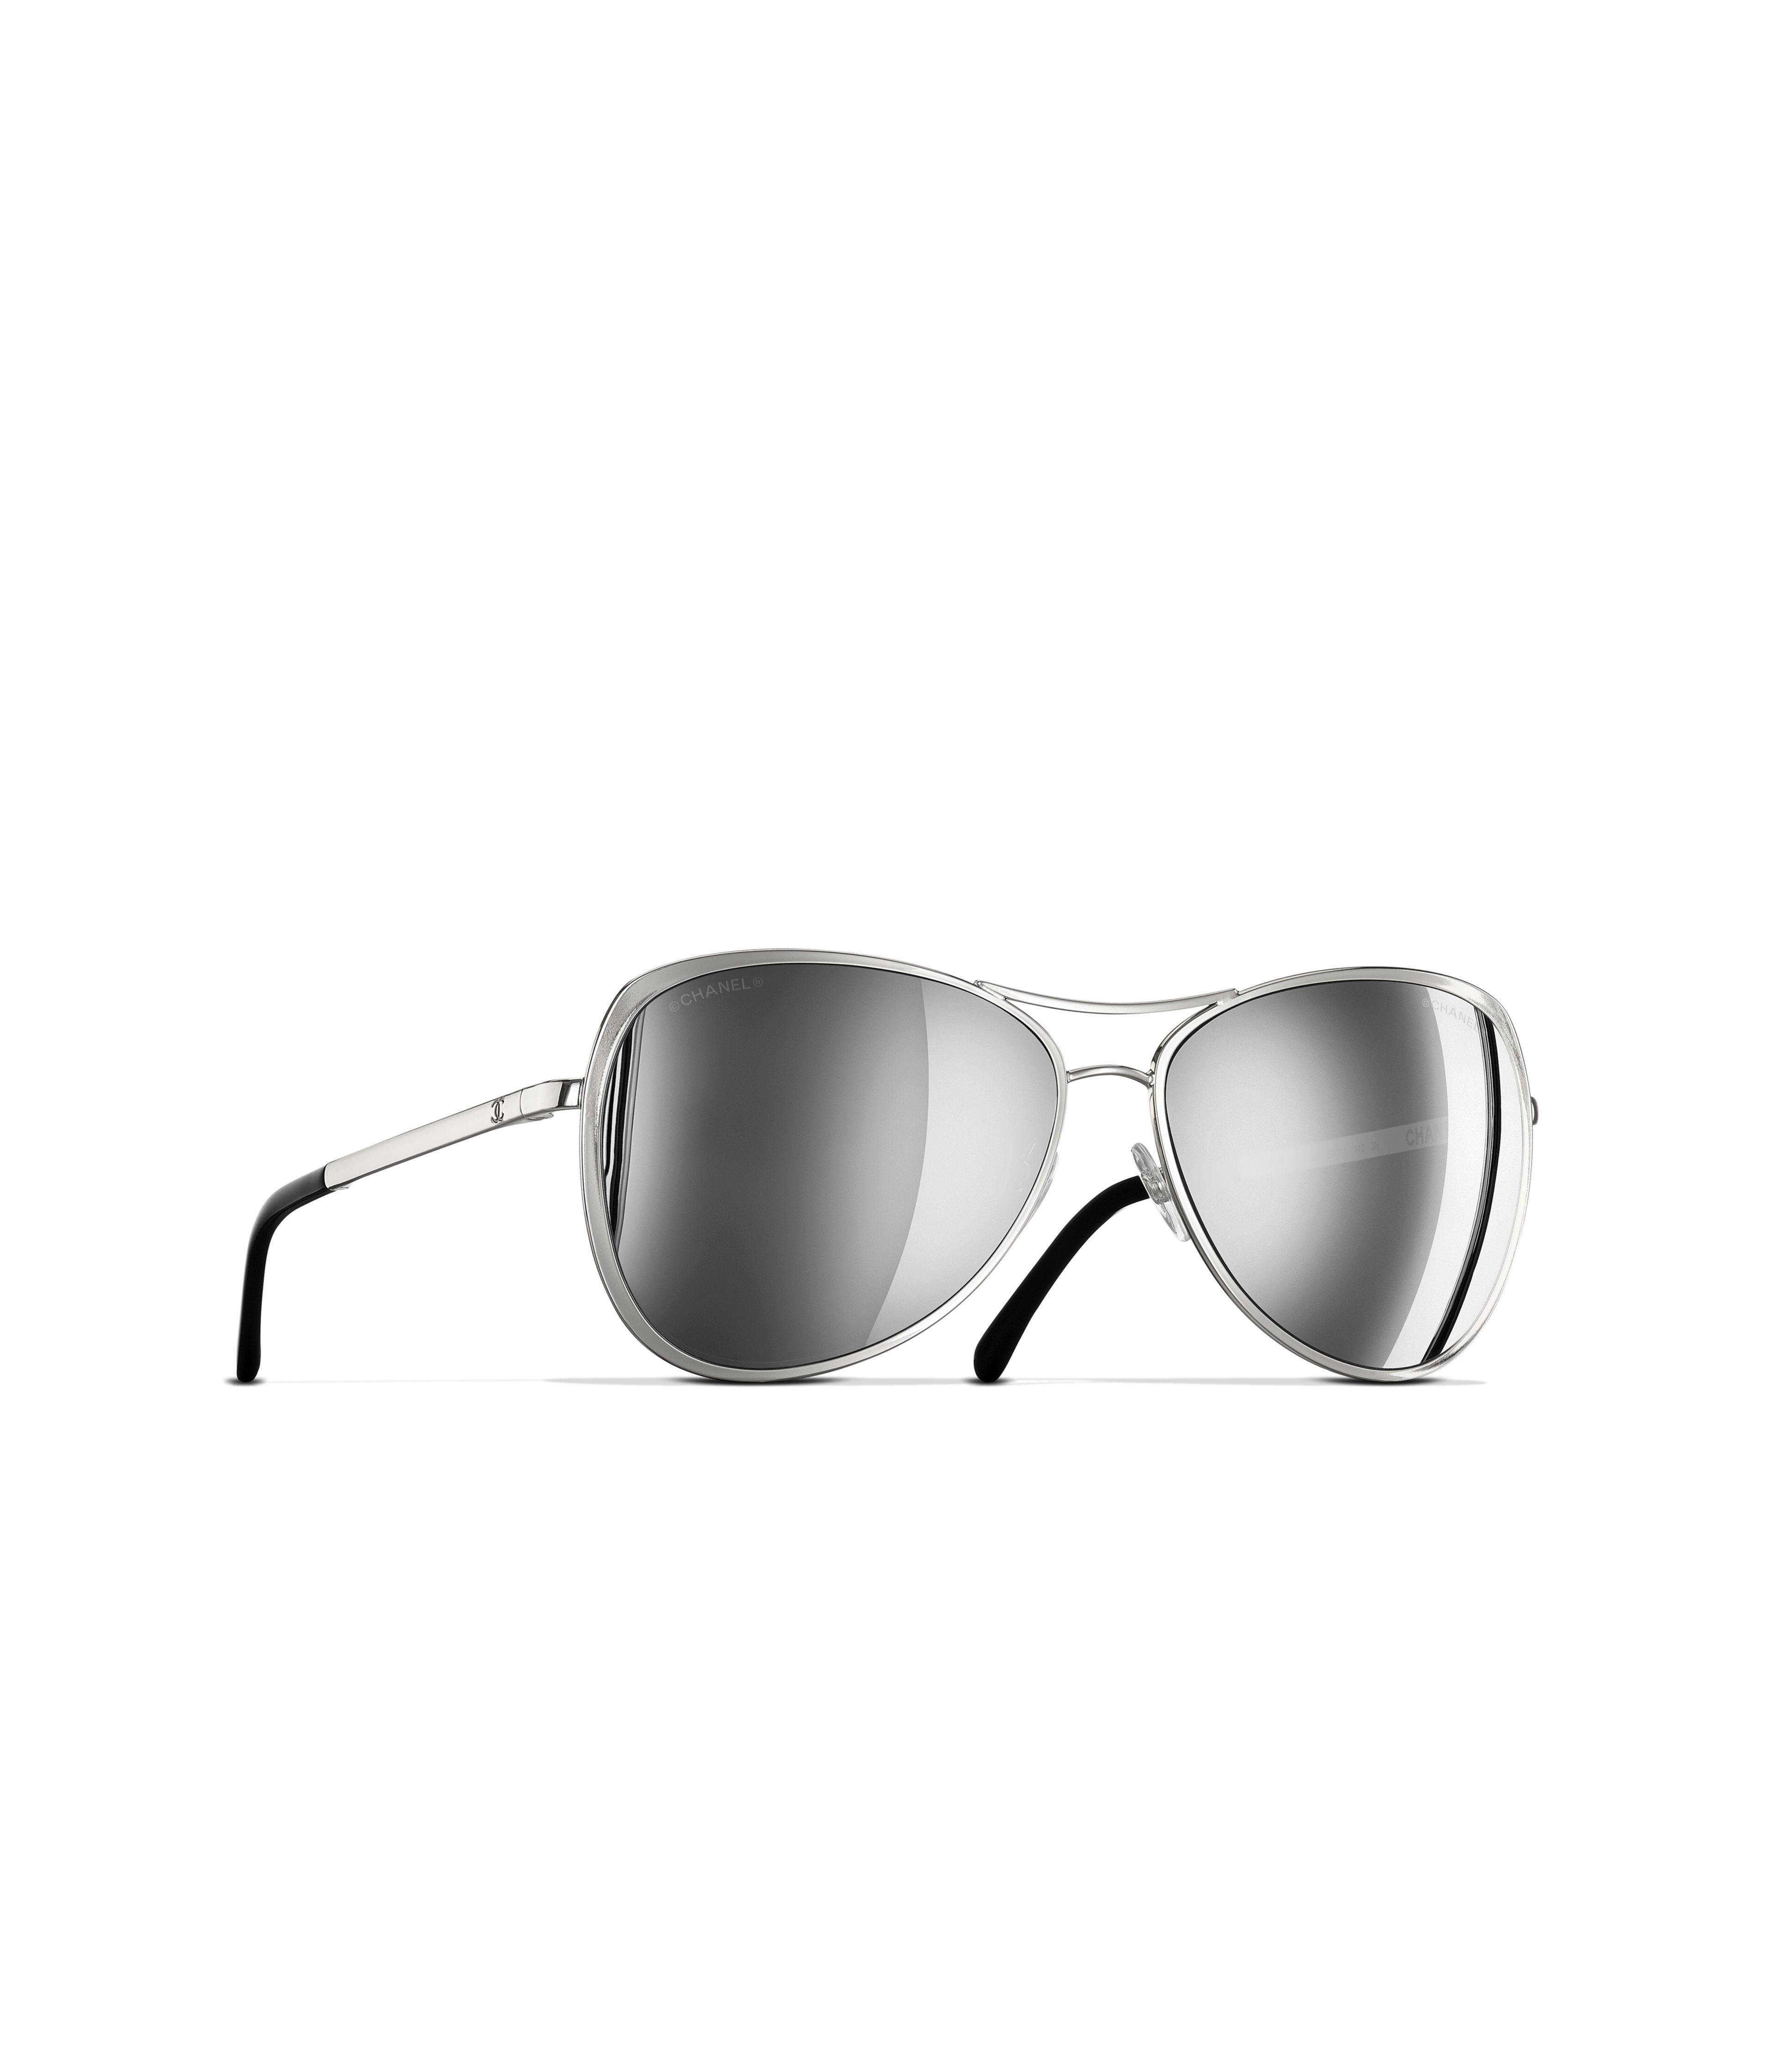 6f1fd98f64 Pilot Sunglasses Ref. 4223 C1246G